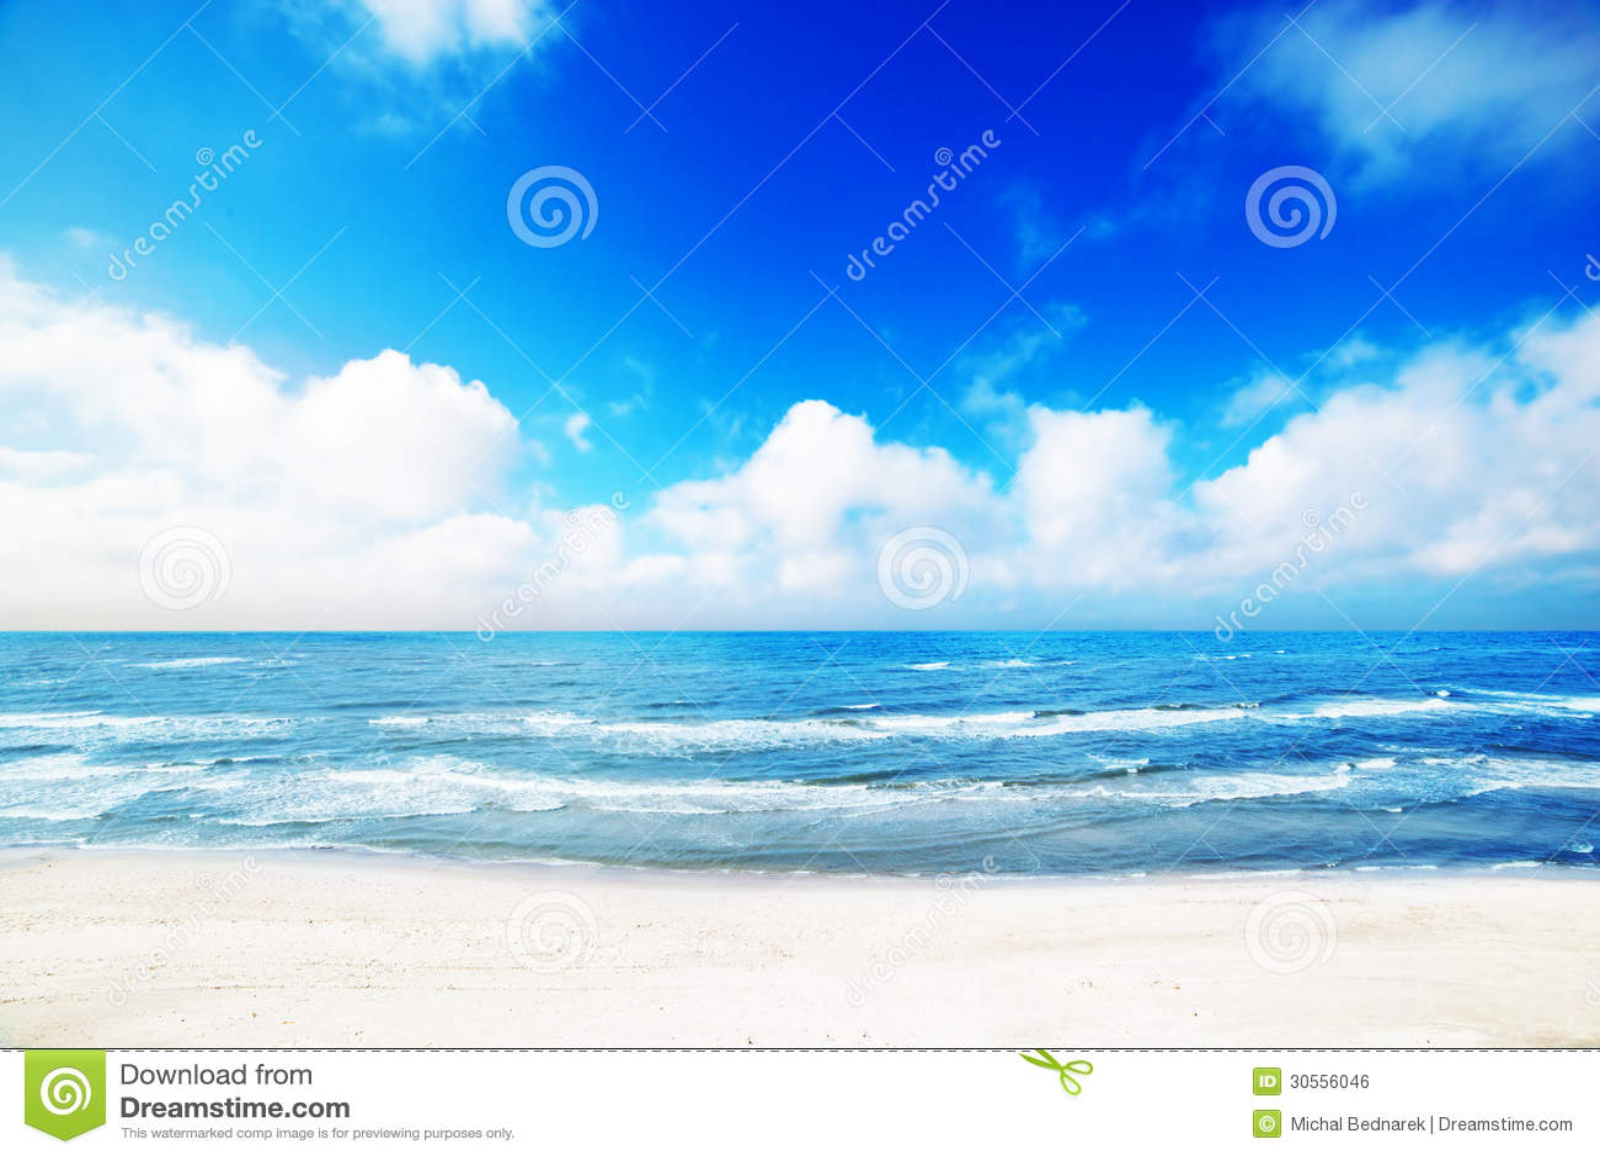 Hot summer beach, sea scenery